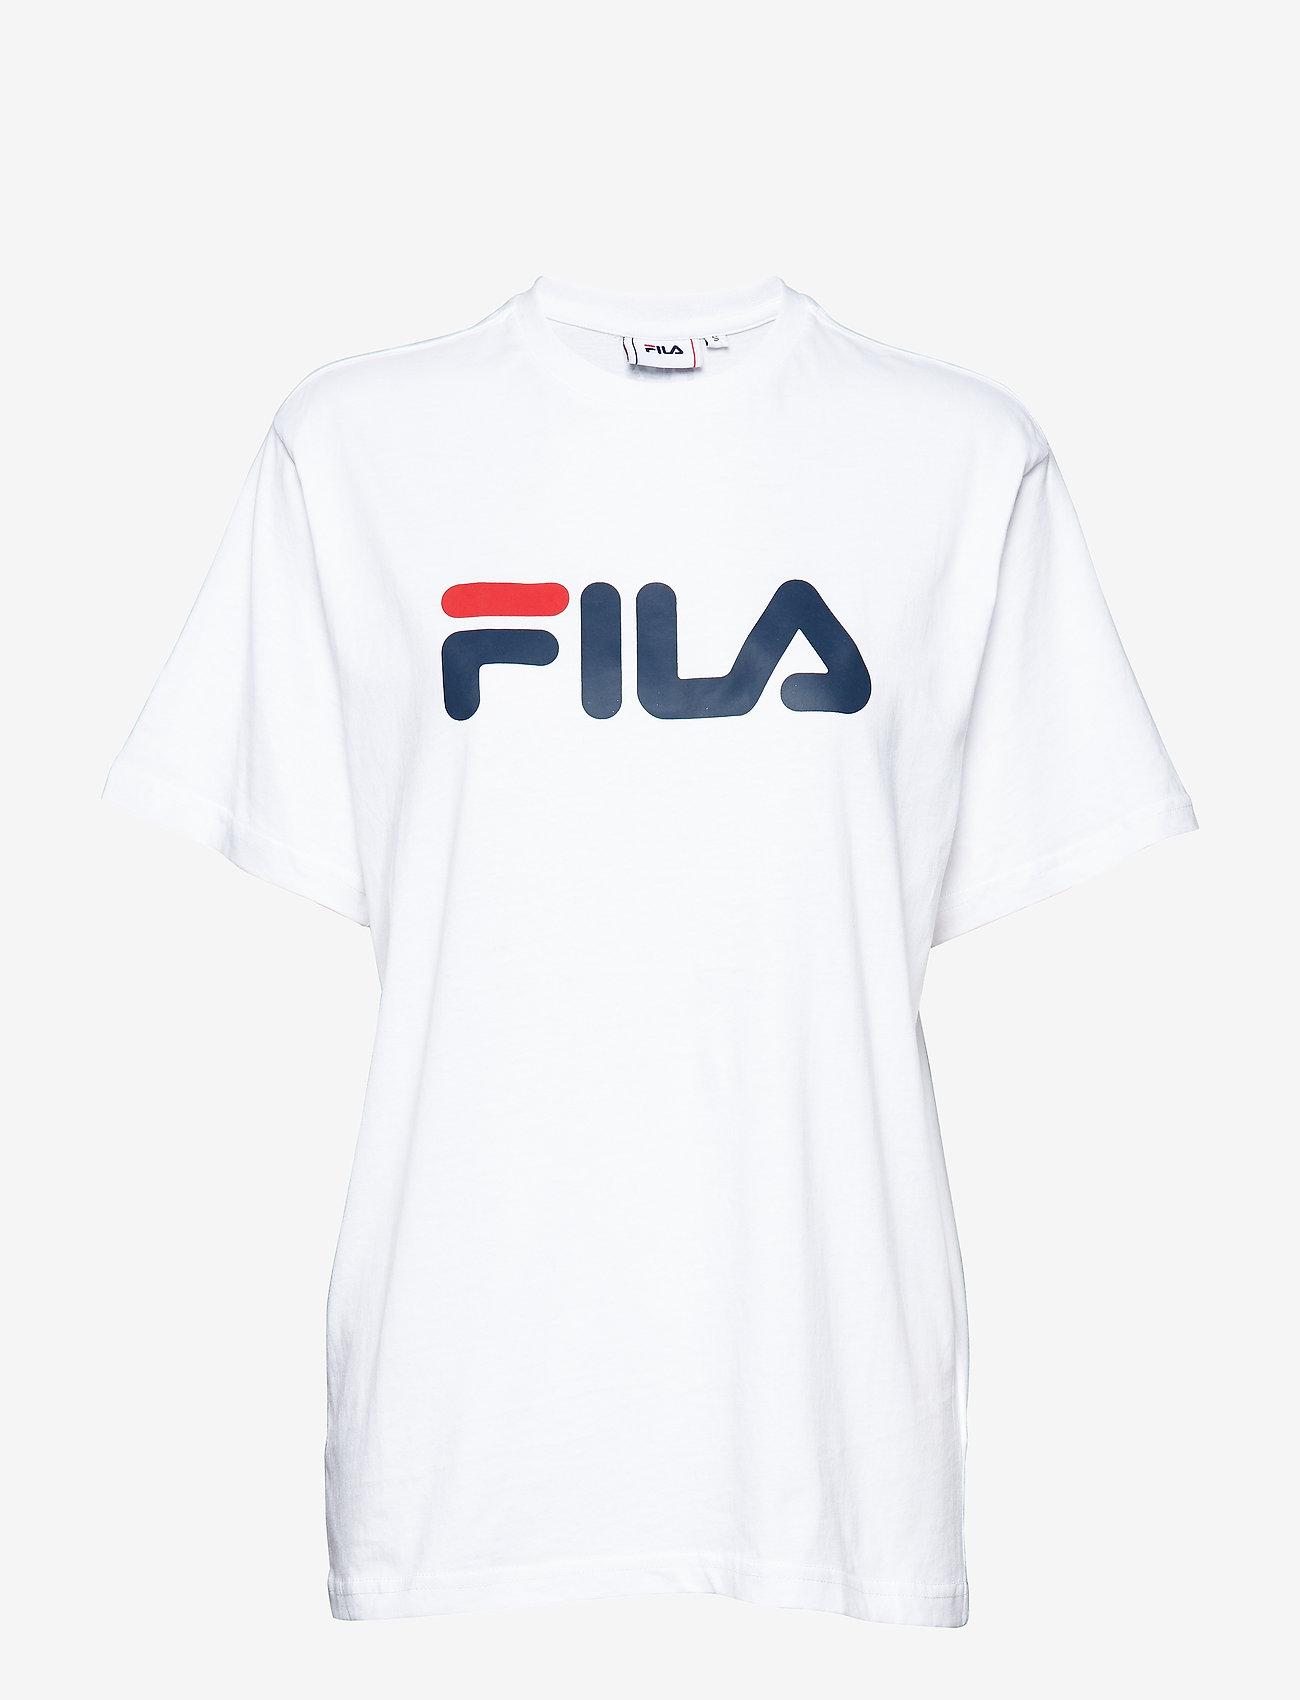 FILA - UNISEX CLASSIC PURE ss tee - t-shirts - bright white - 0